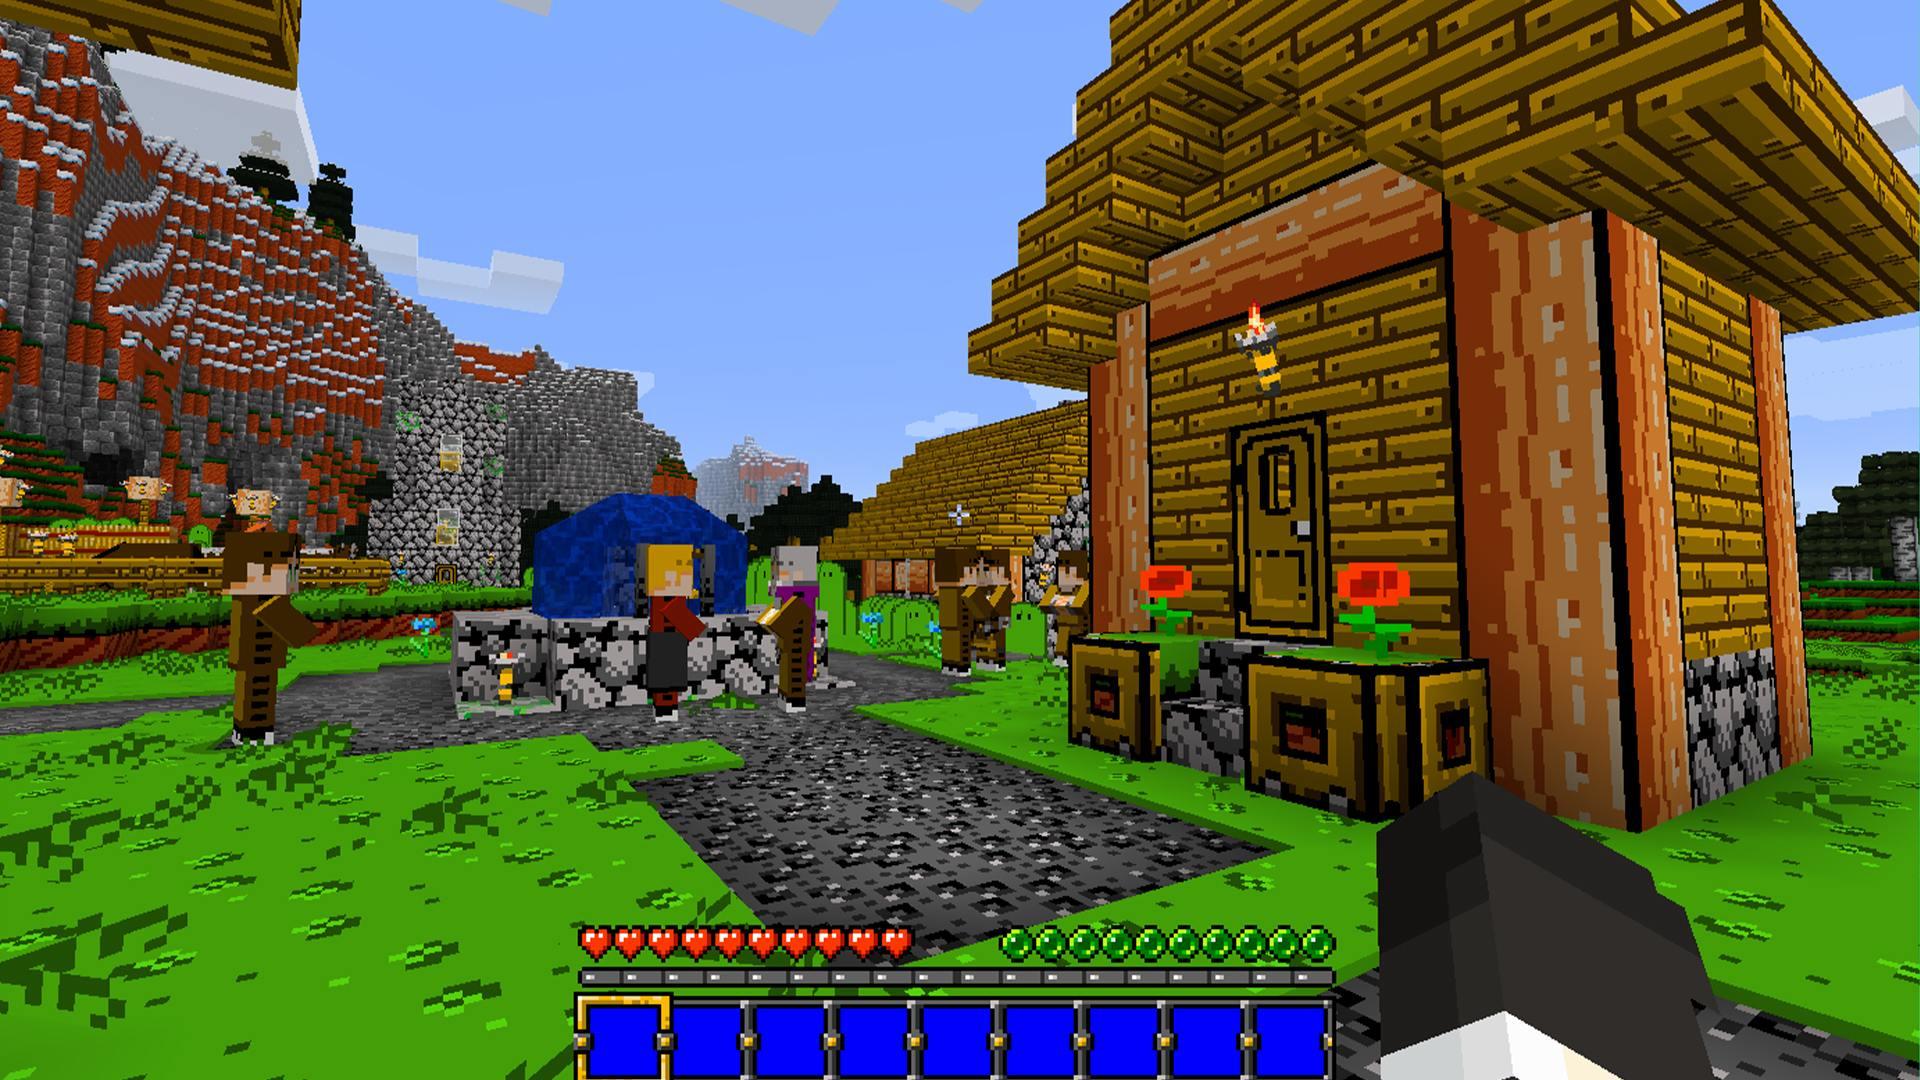 Minecraft was in bedeutet treue Was bedeutet